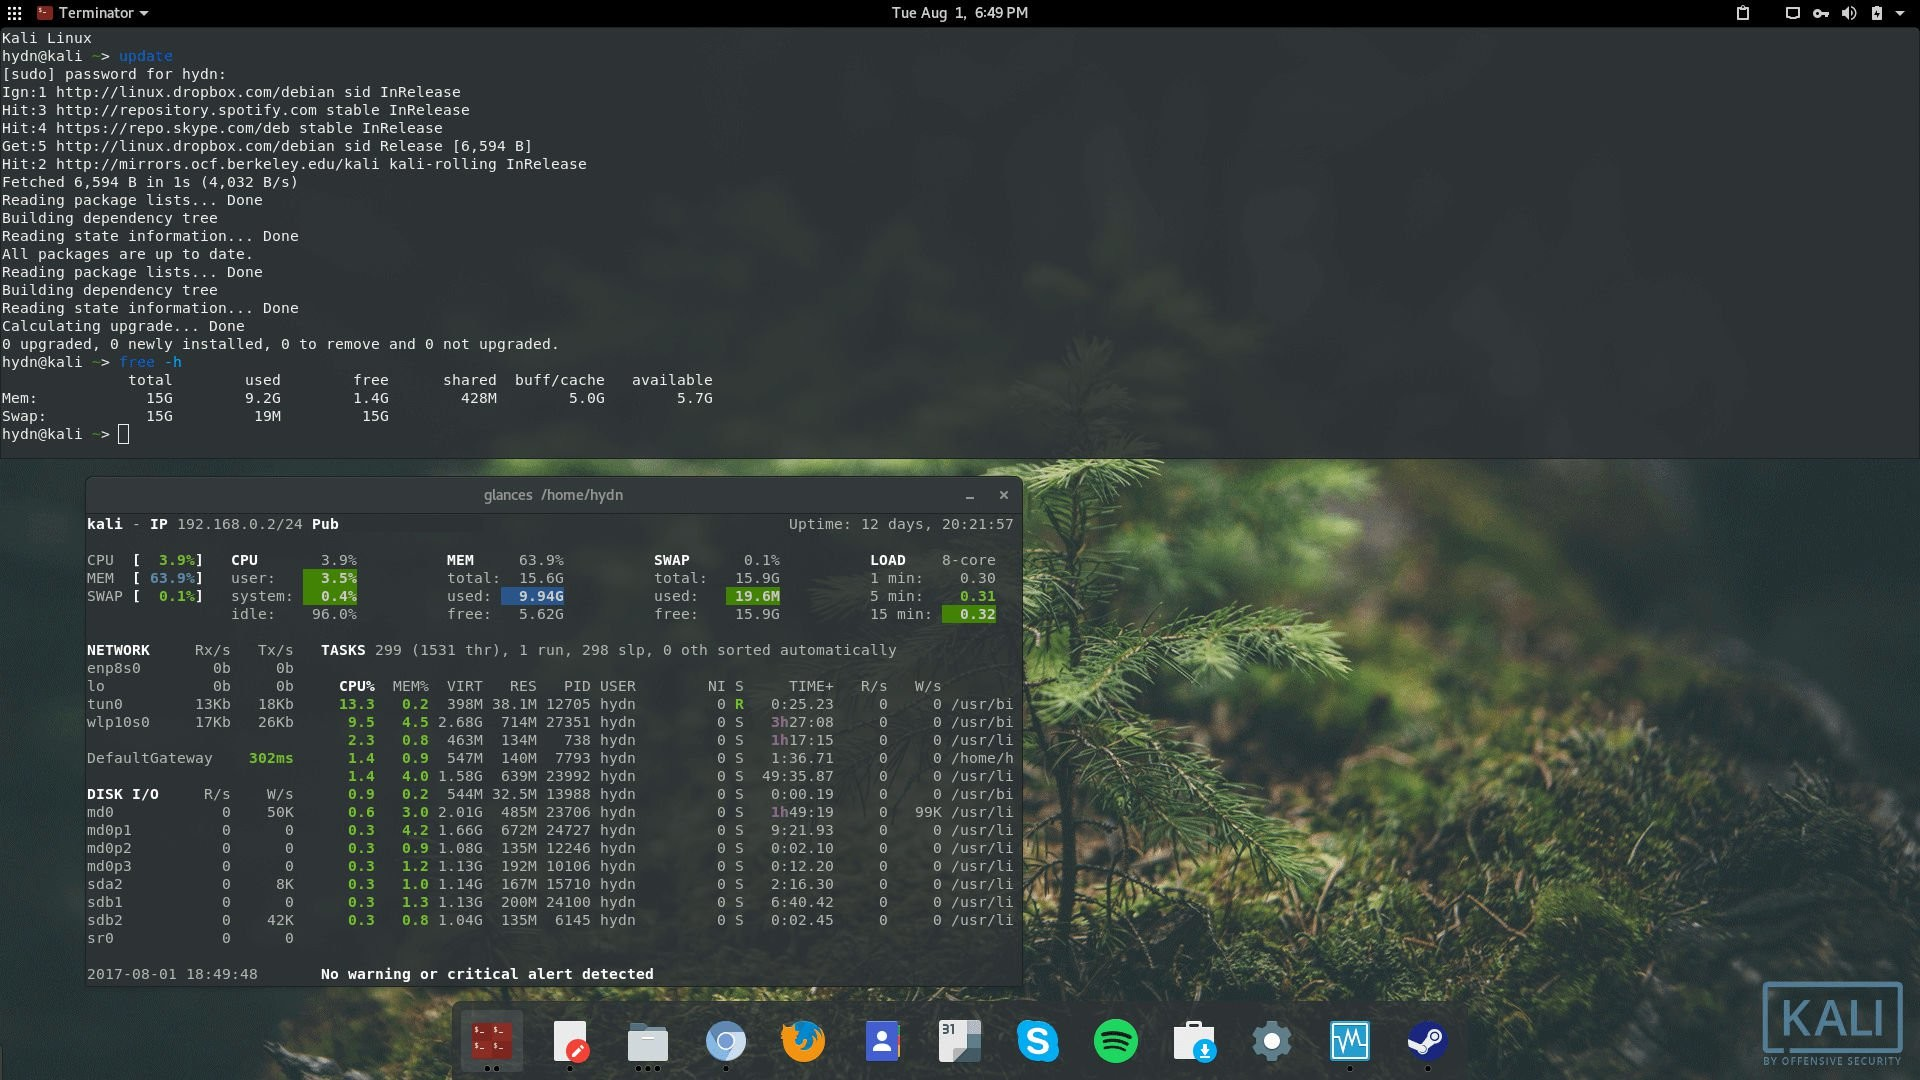 Kali Linux Wallpaper 1920x1080 (83+ images)